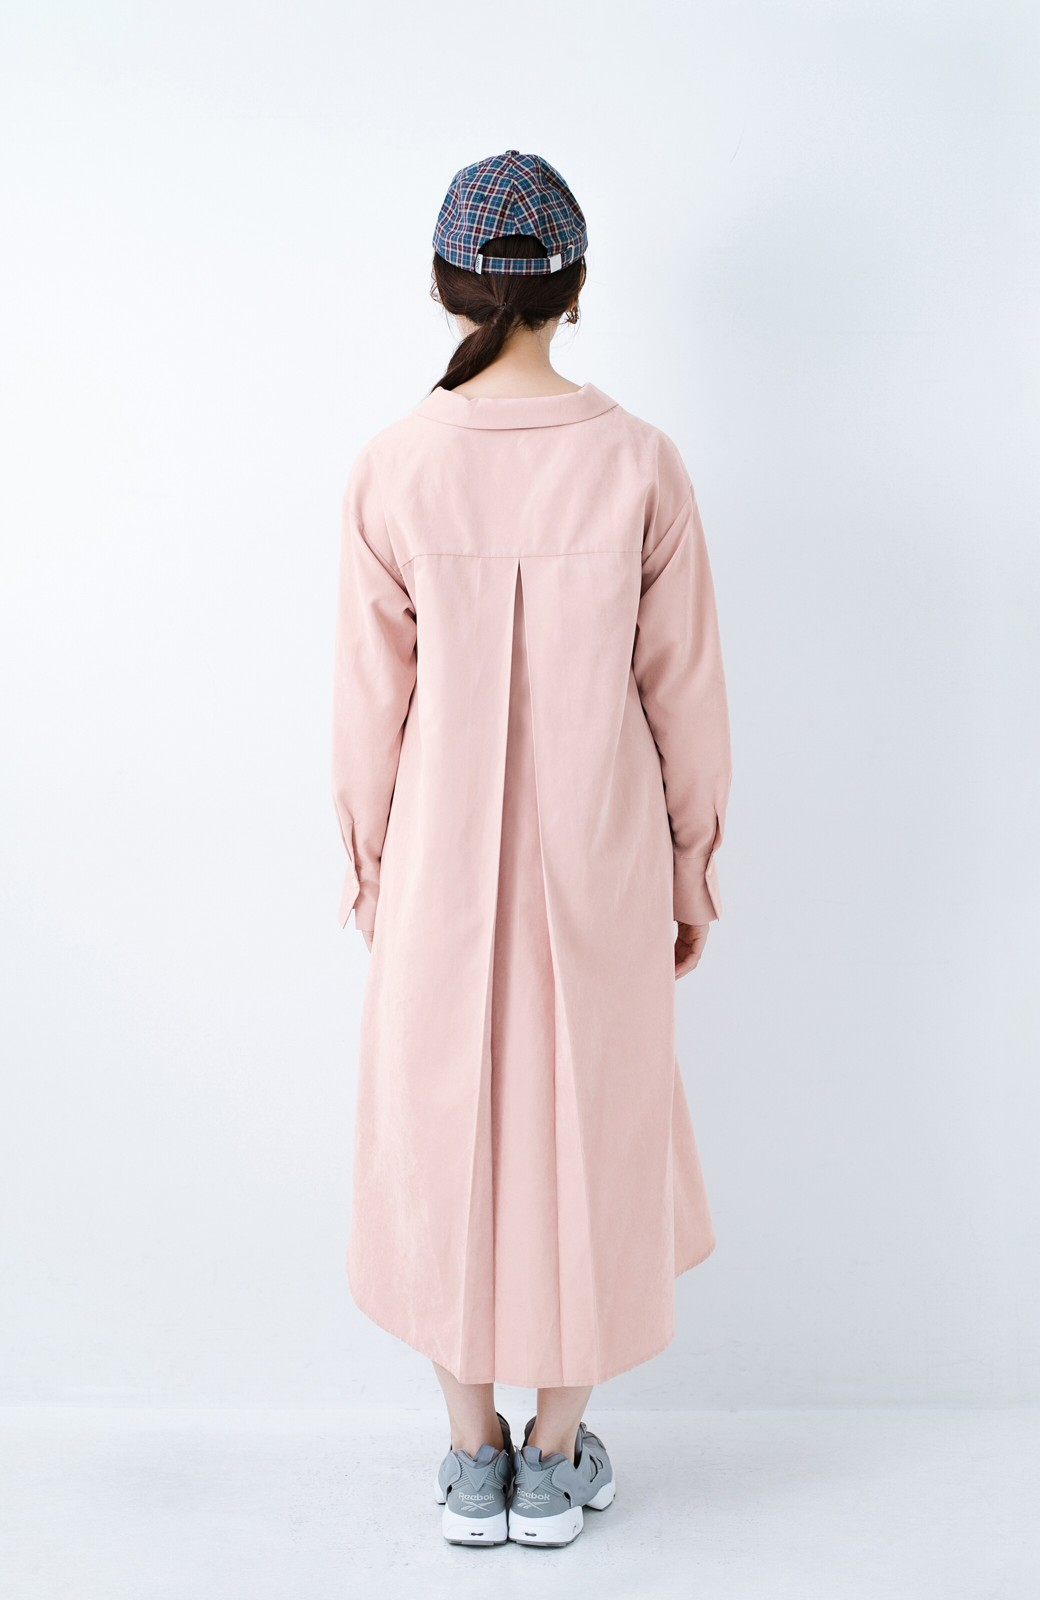 haco! 太ってもばれずに羽織っても便利なAラインワンピース <ピンク>の商品写真16